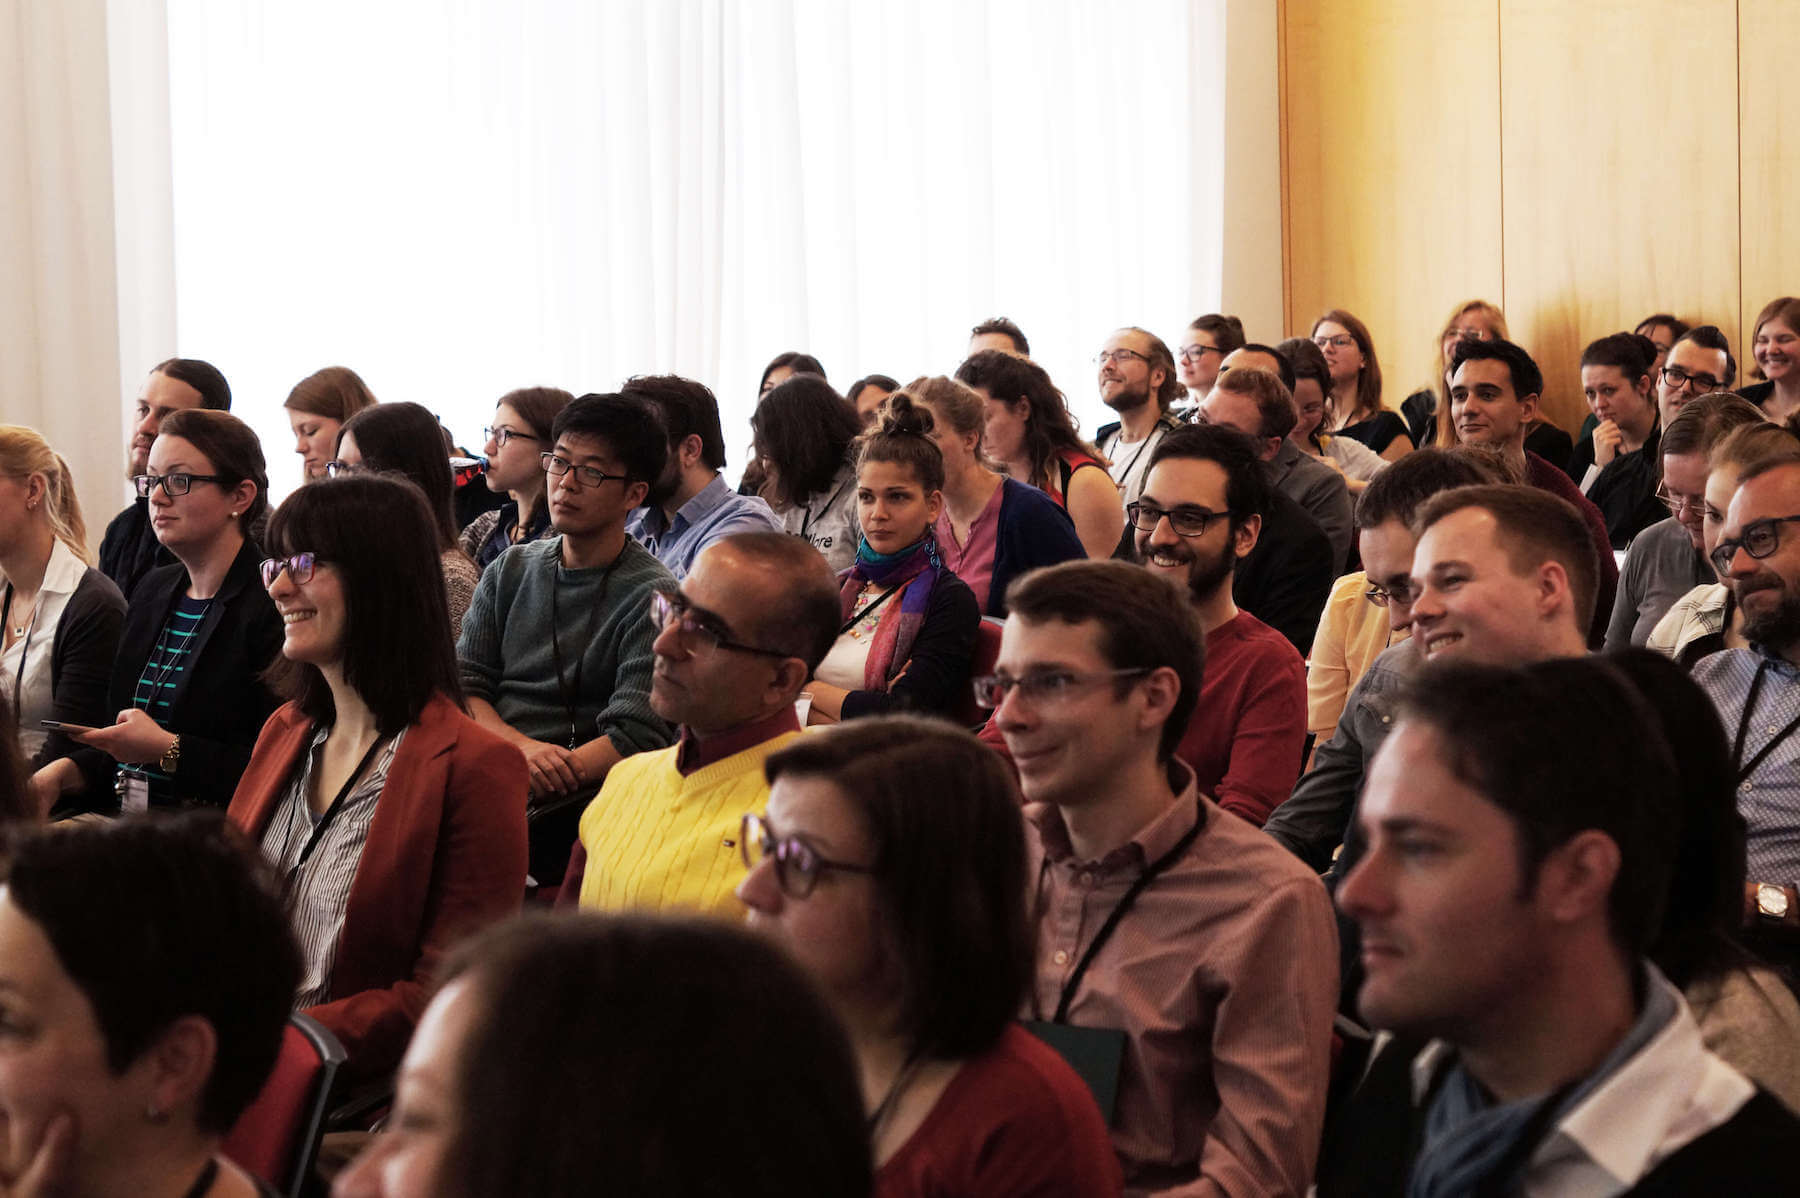 MQIC 2017 conference